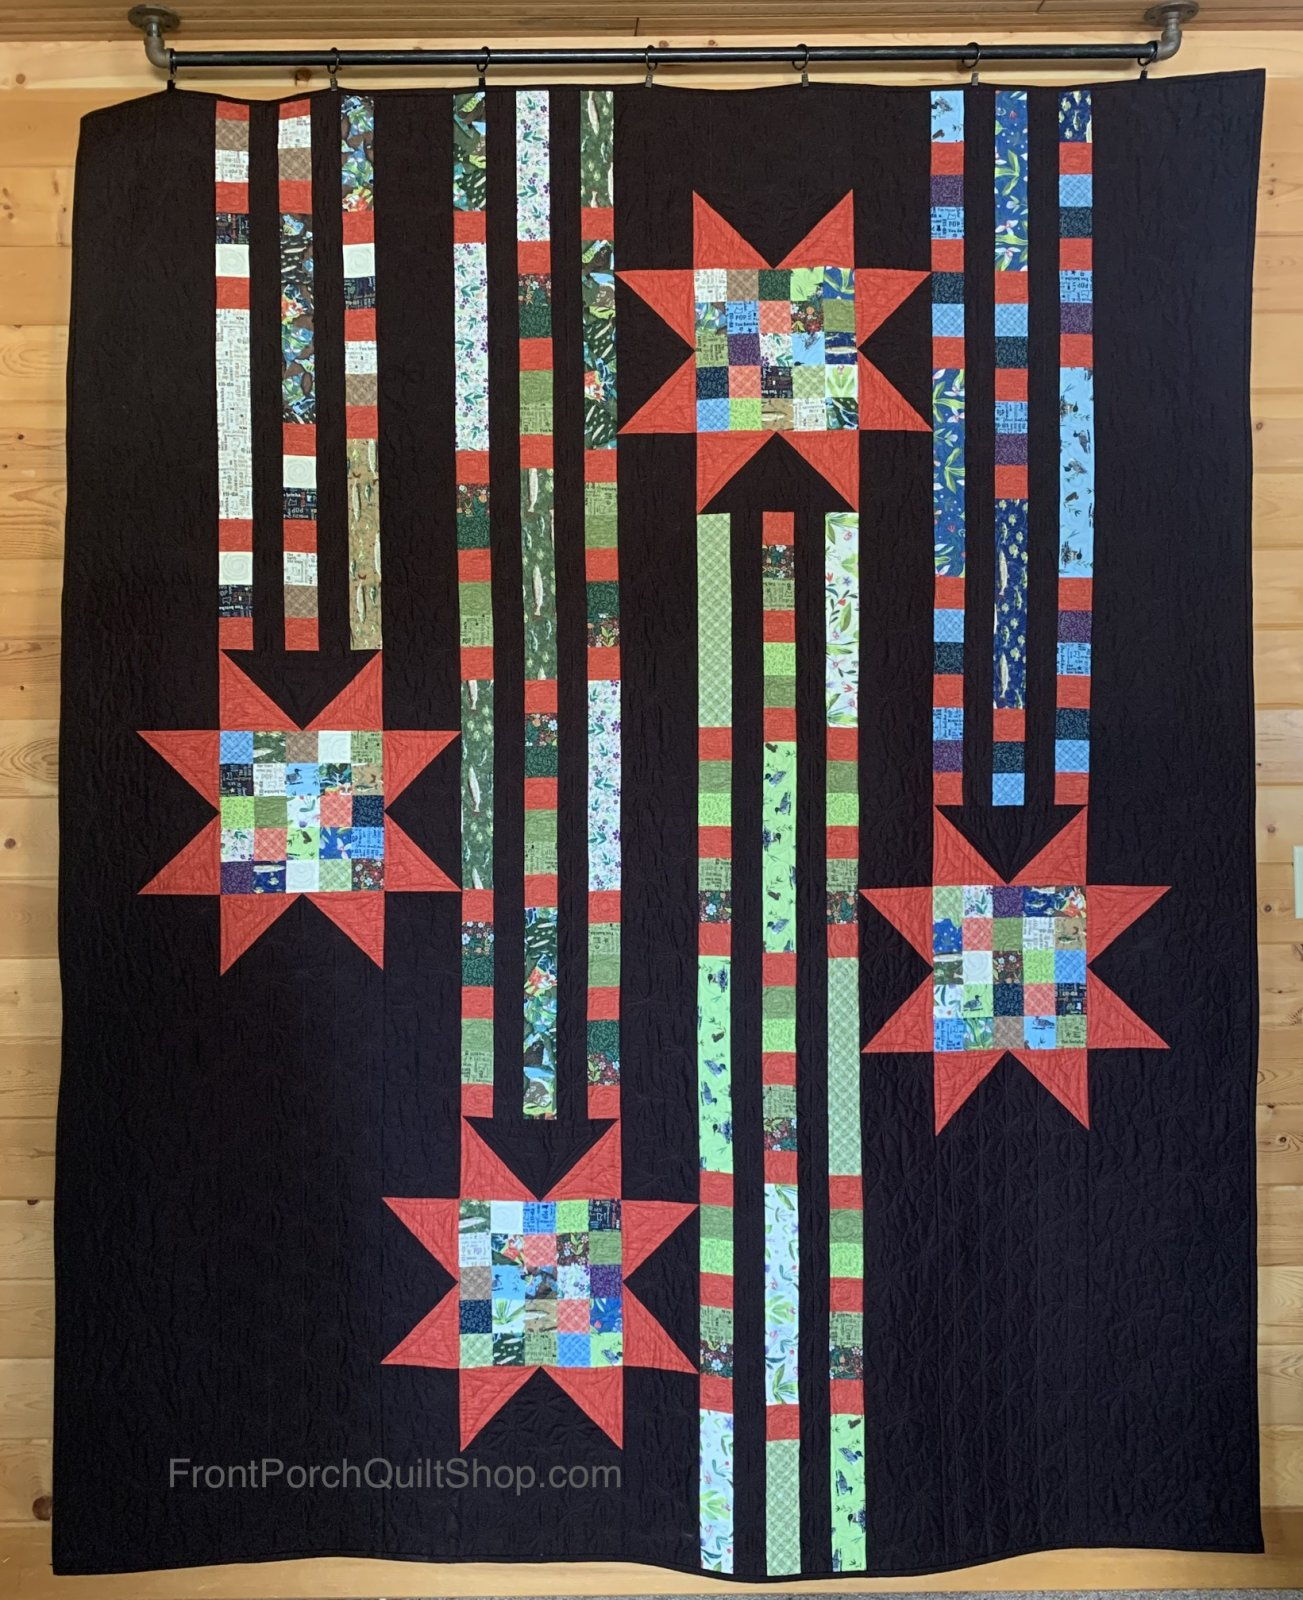 Showering Stars Exclusive Quilt Minnesota 2020 Quilt Kit